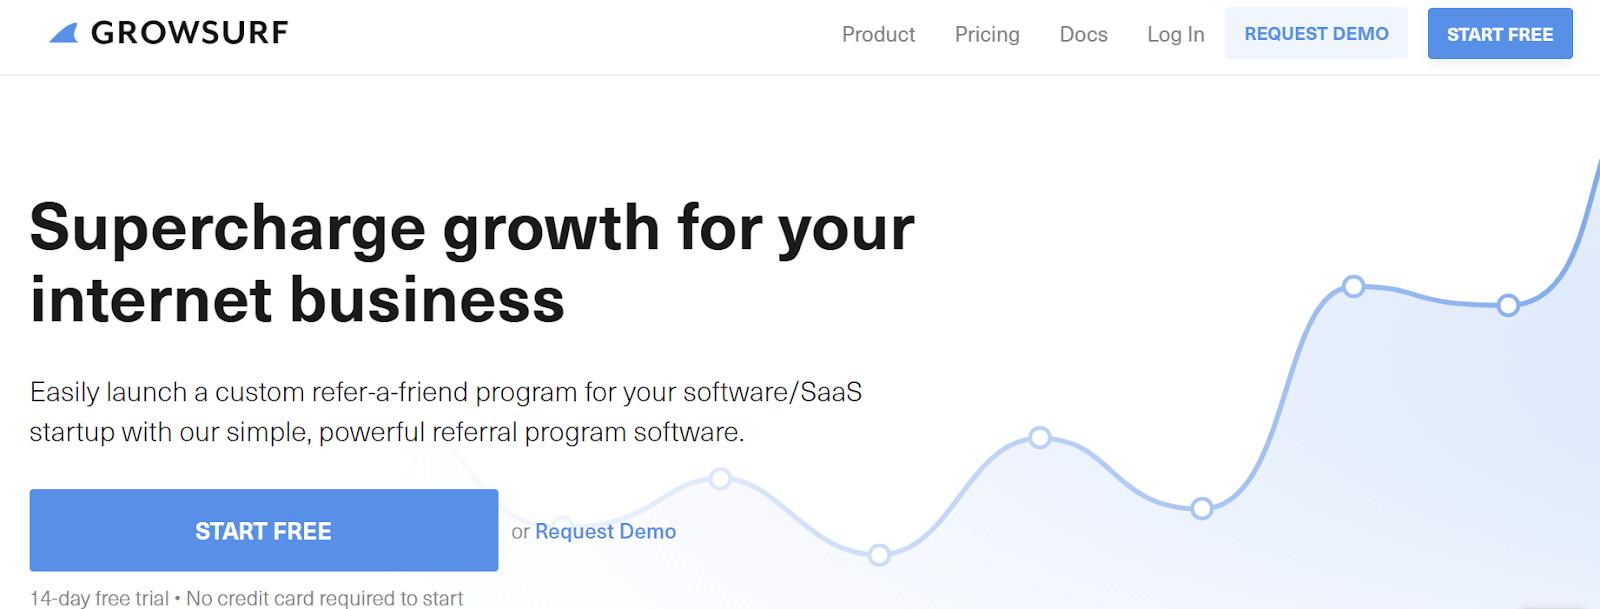 GrowSurf Referral Marketing Software Tool